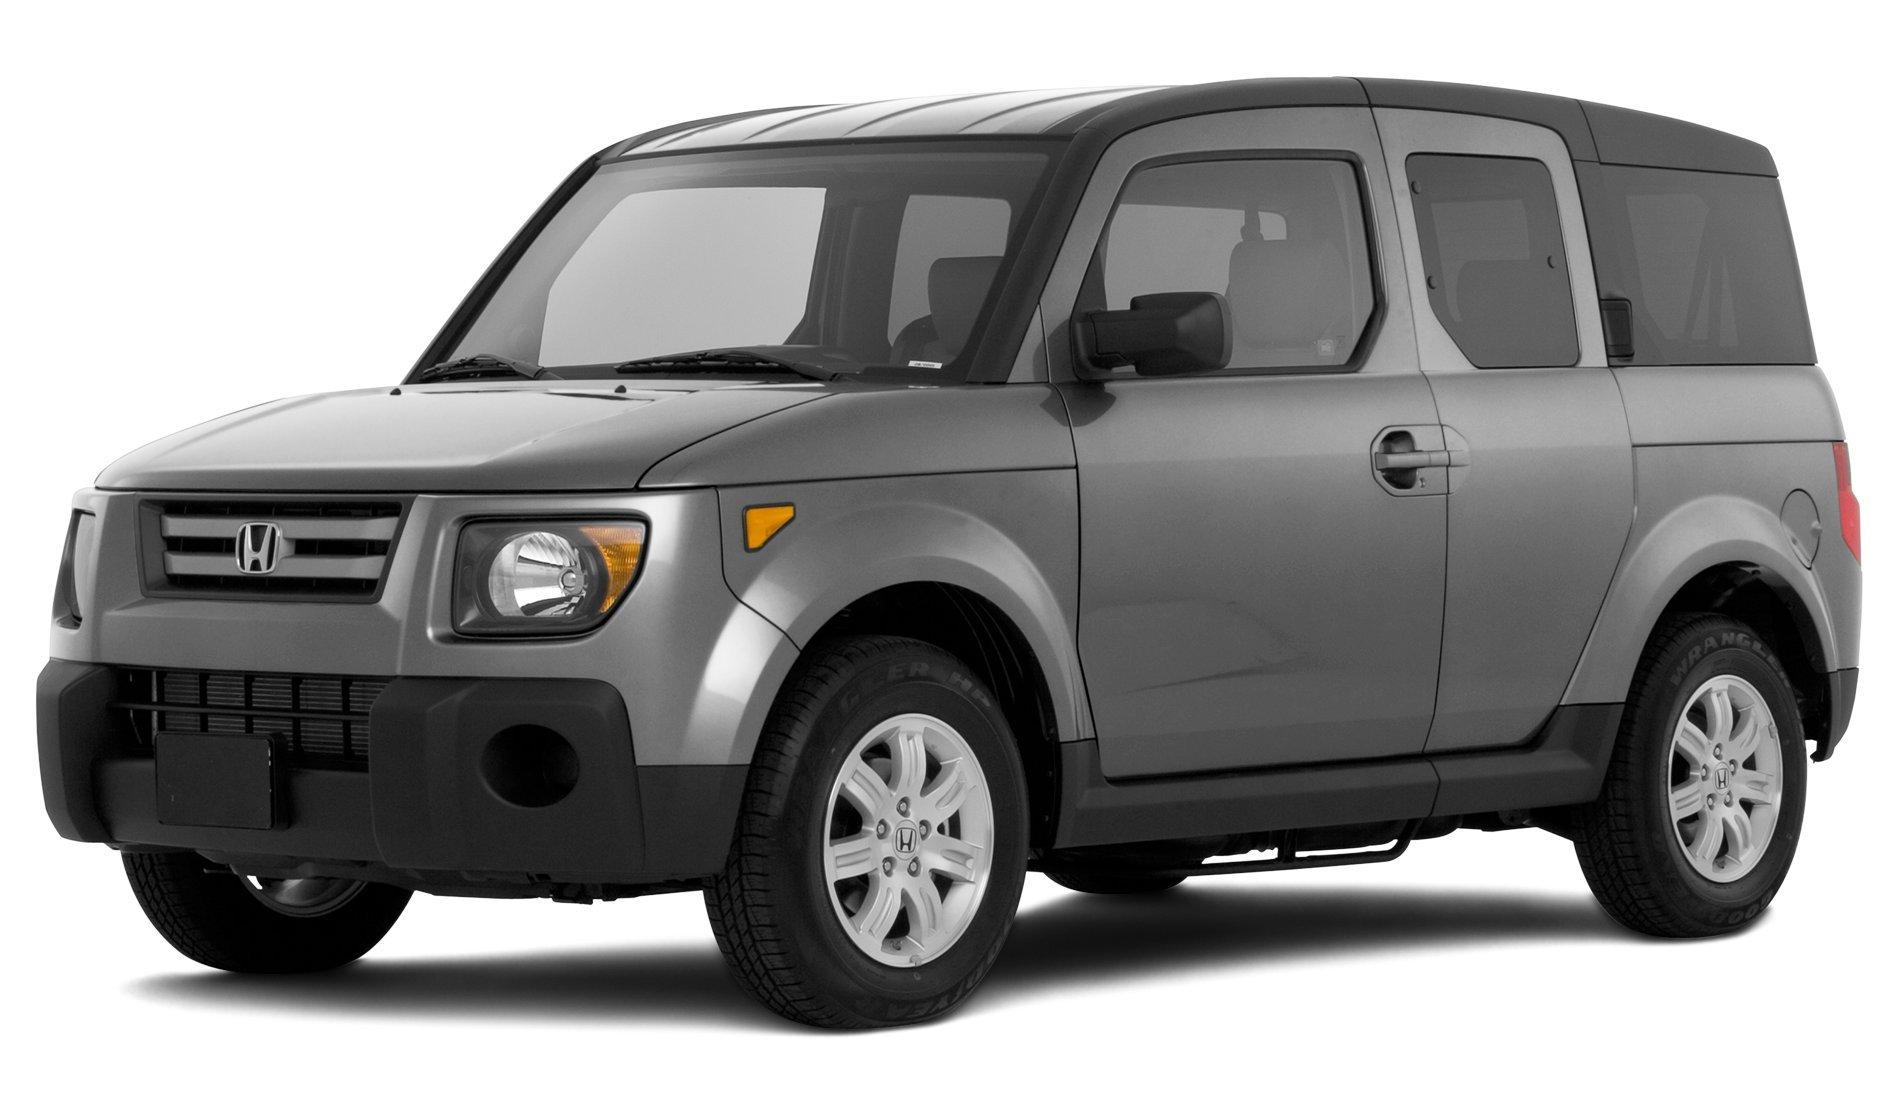 2008 Honda Element EX, 2-Wheel Drive 5-Door Automatic Transmission